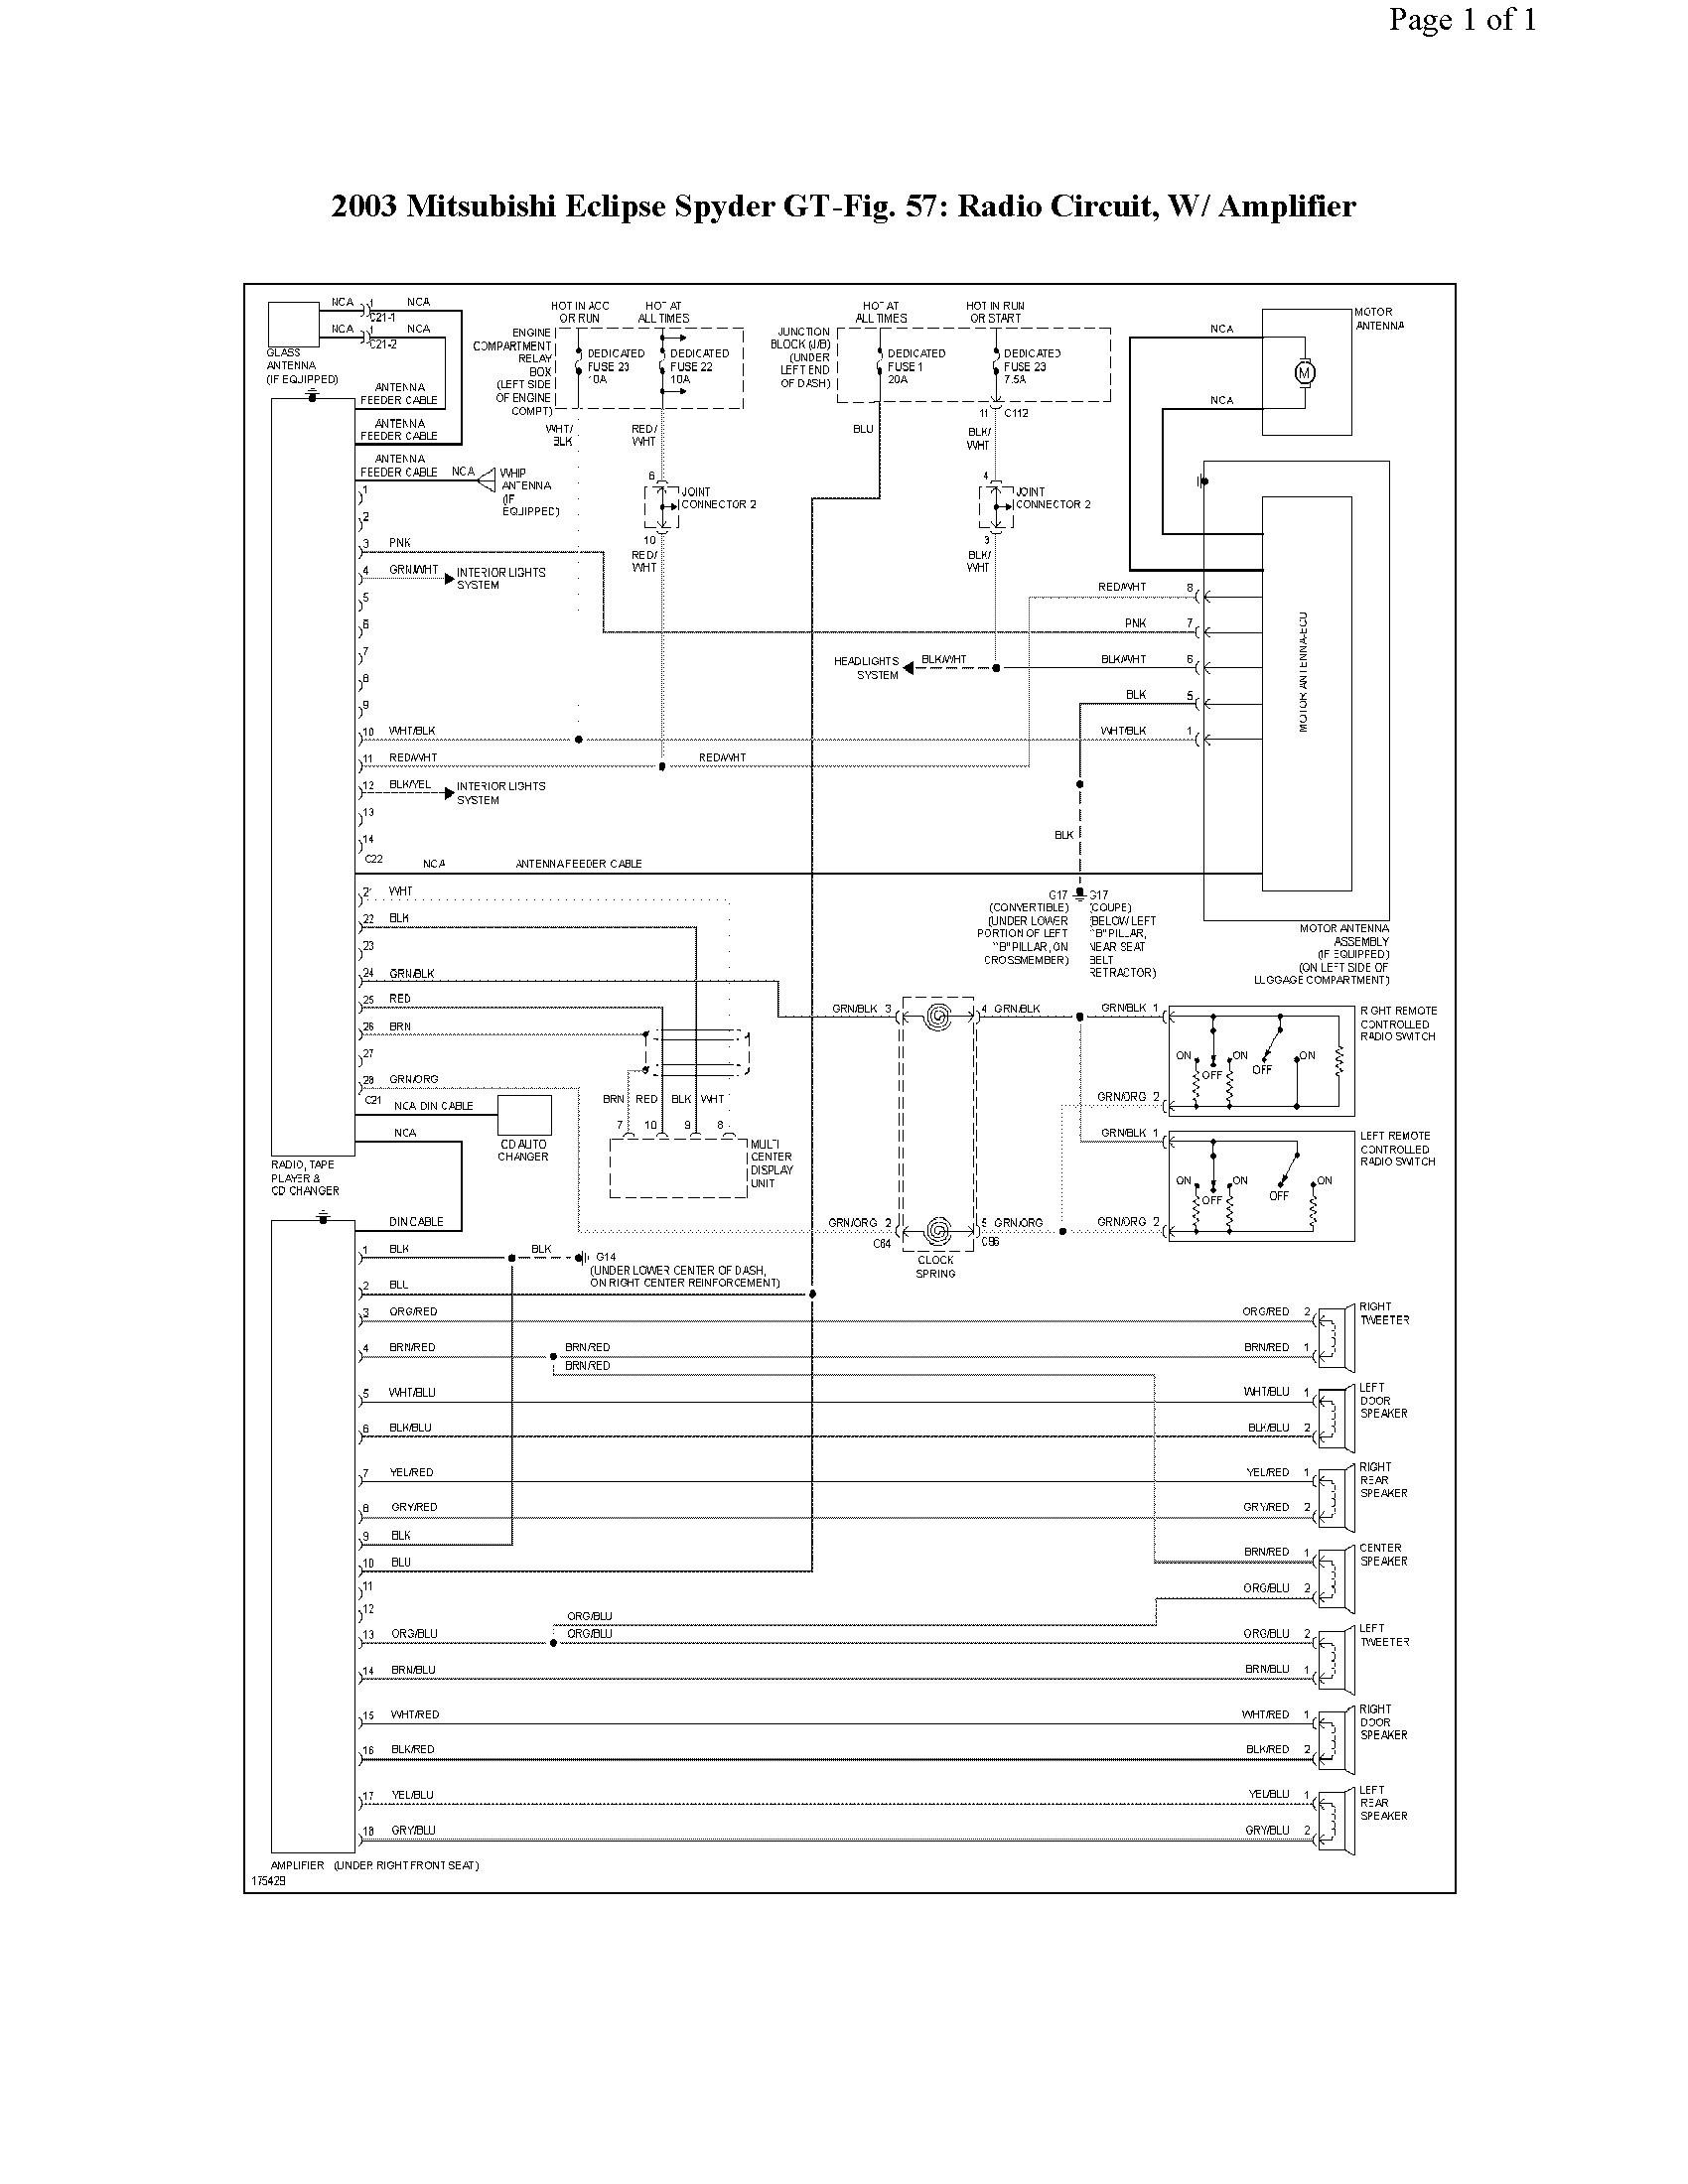 1995mitsubishi Eclipse Tranny Wiring Diagram Mitsubishi Eclipse Wiring Diagram Of 1995mitsubishi Eclipse Tranny Wiring Diagram